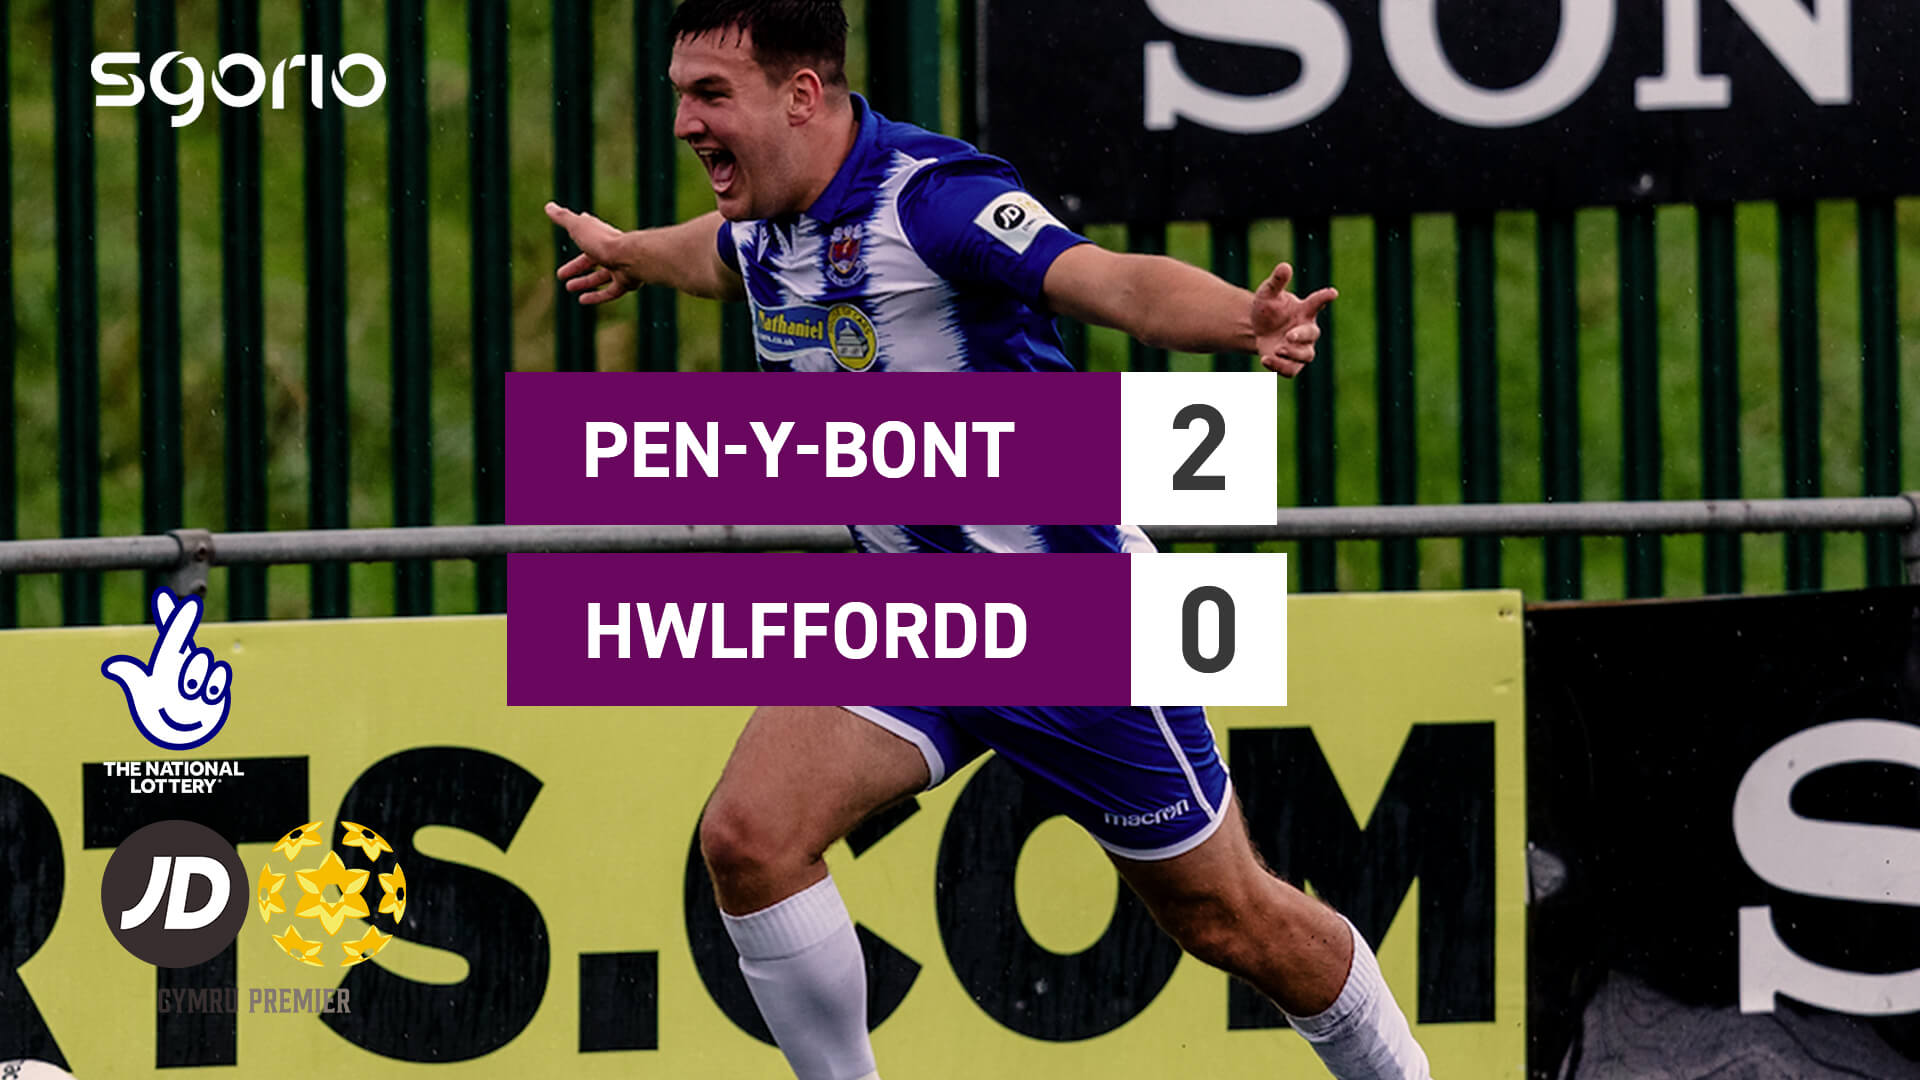 Pen-y-bont 2-0 Hwlffordd